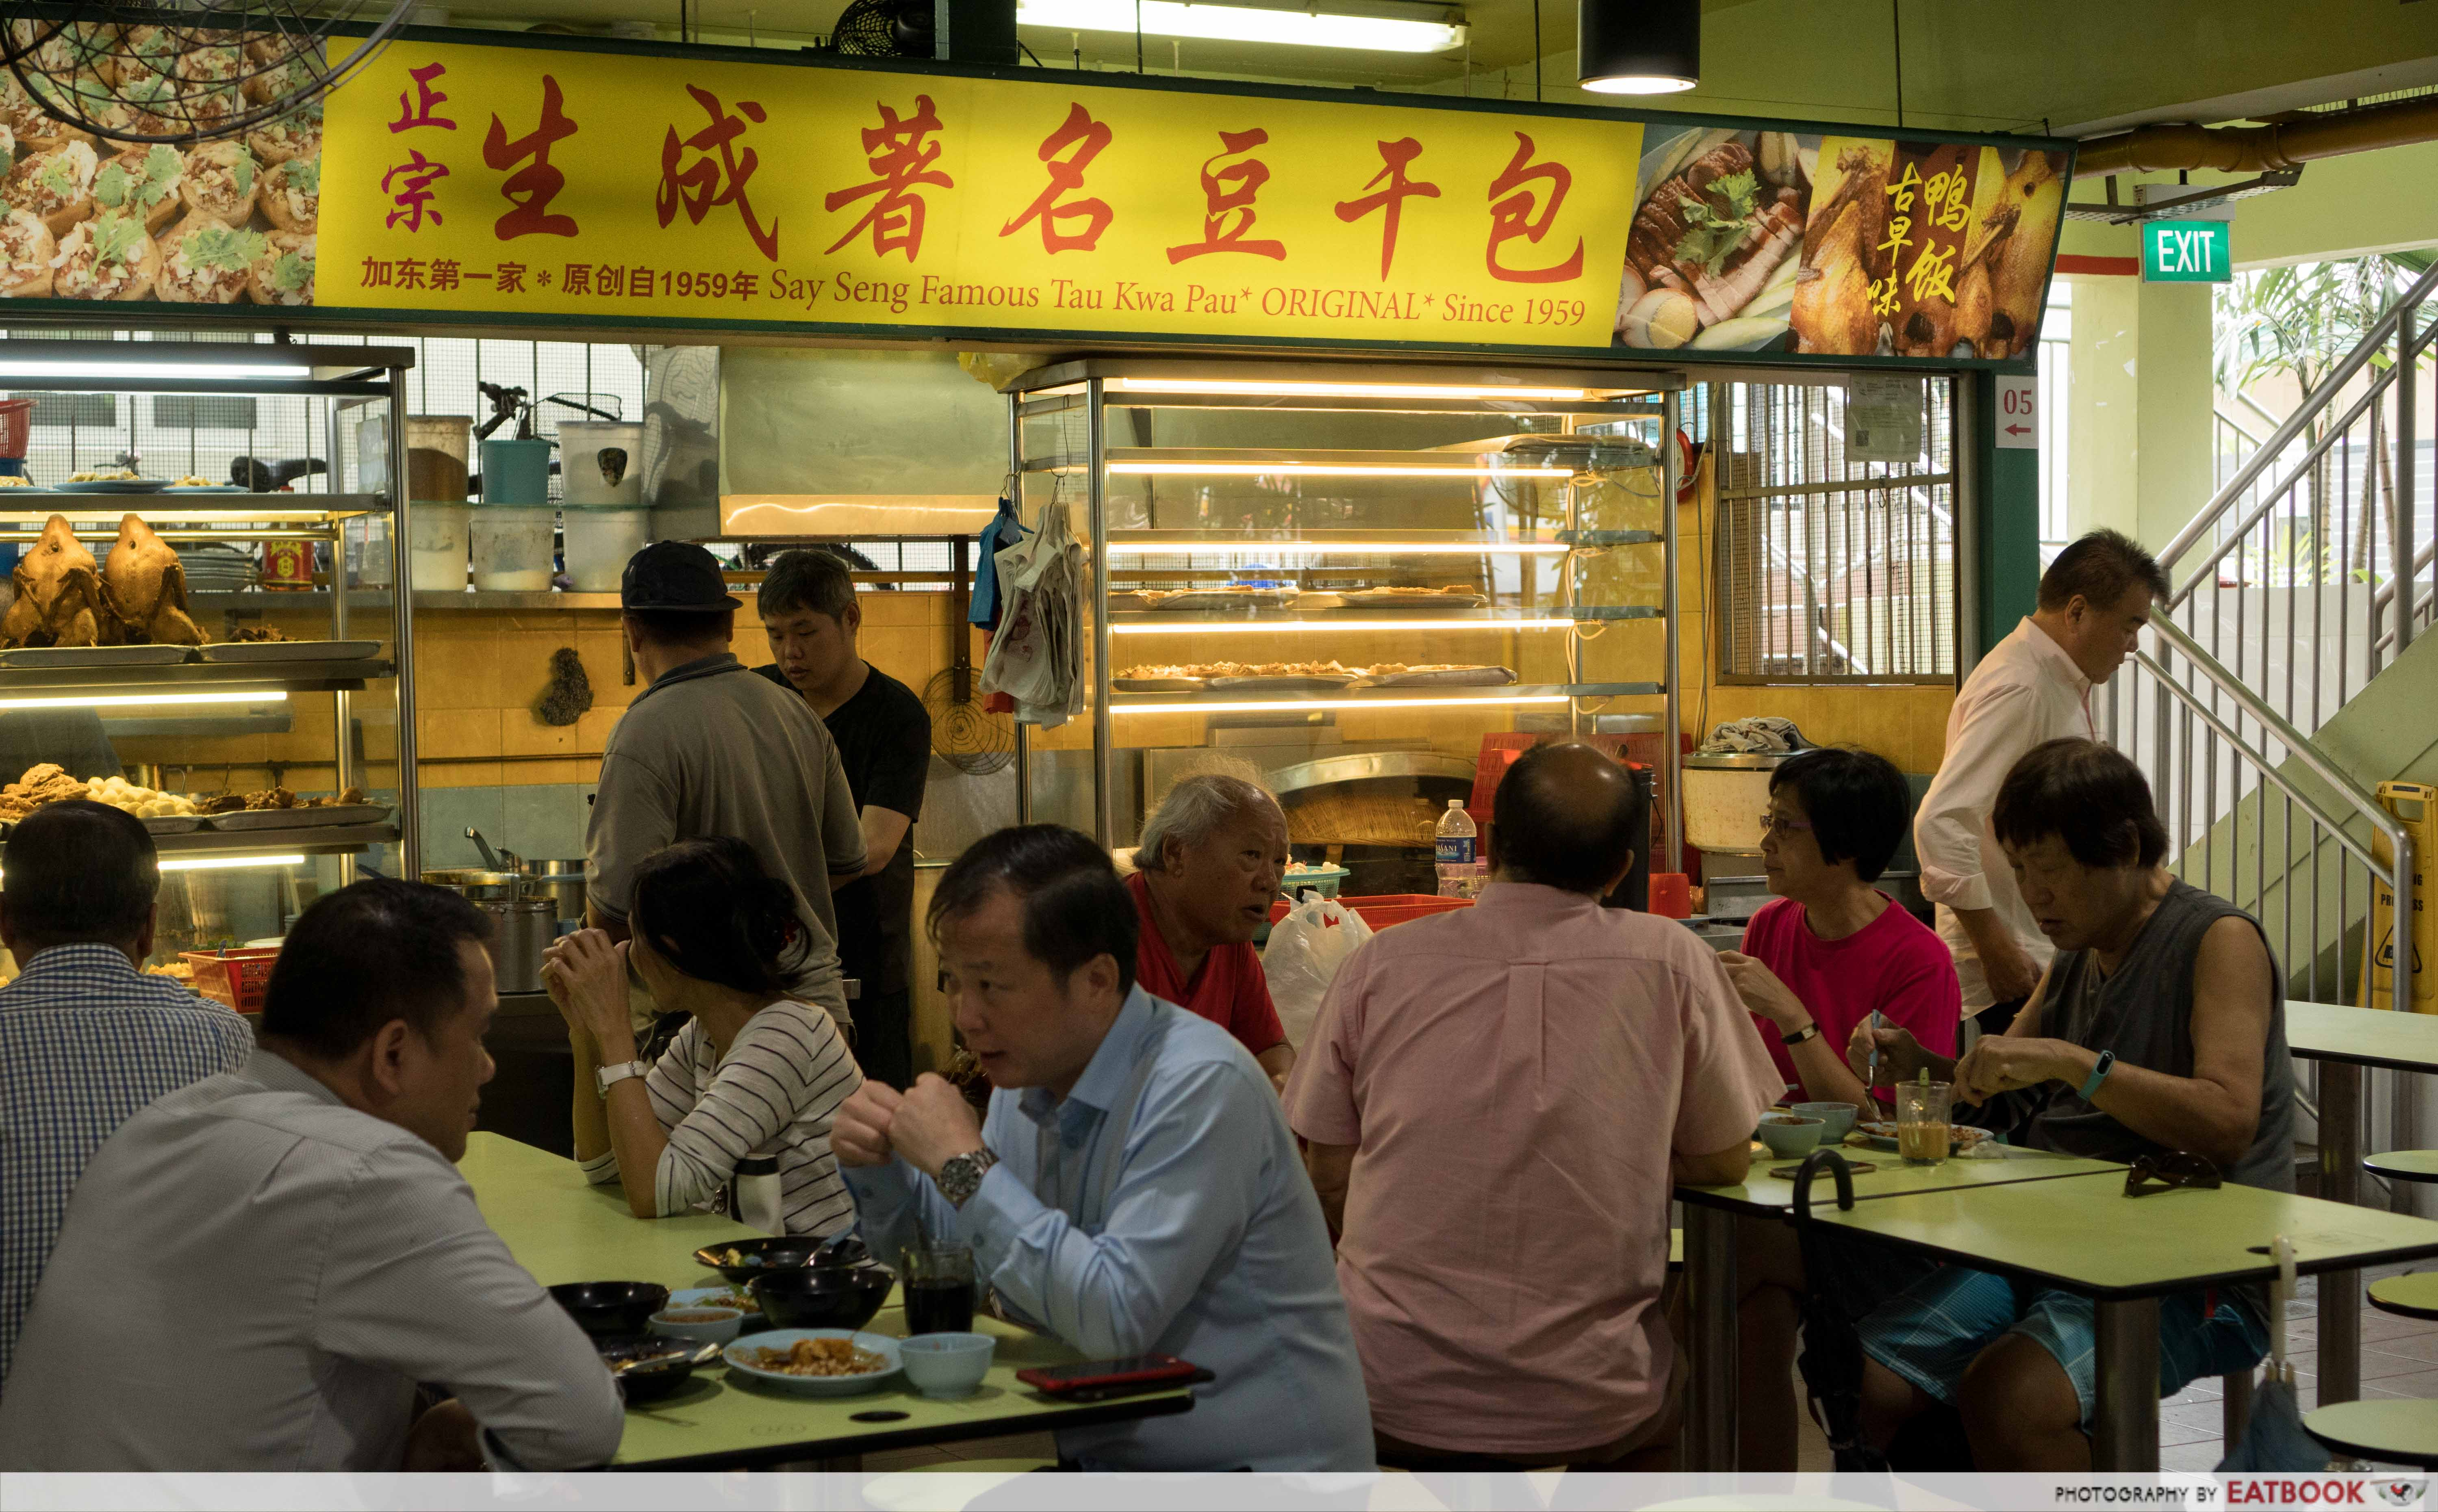 Say Seng Tau Kwa Pau stall